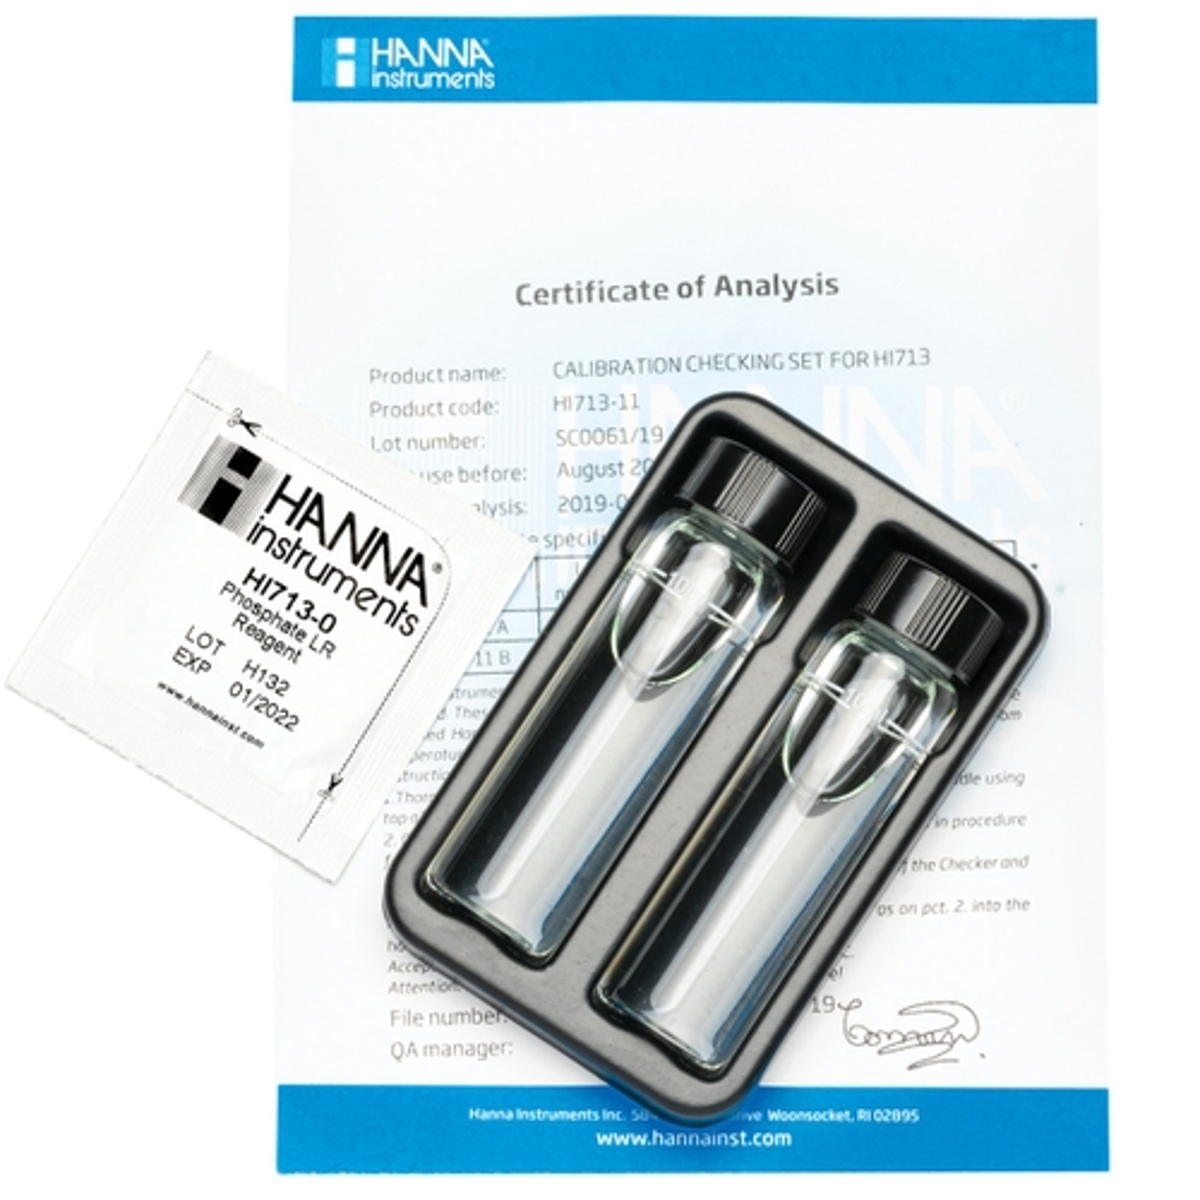 HI713-11 Phosphate Low Range Checker HC® Calibration Check Set